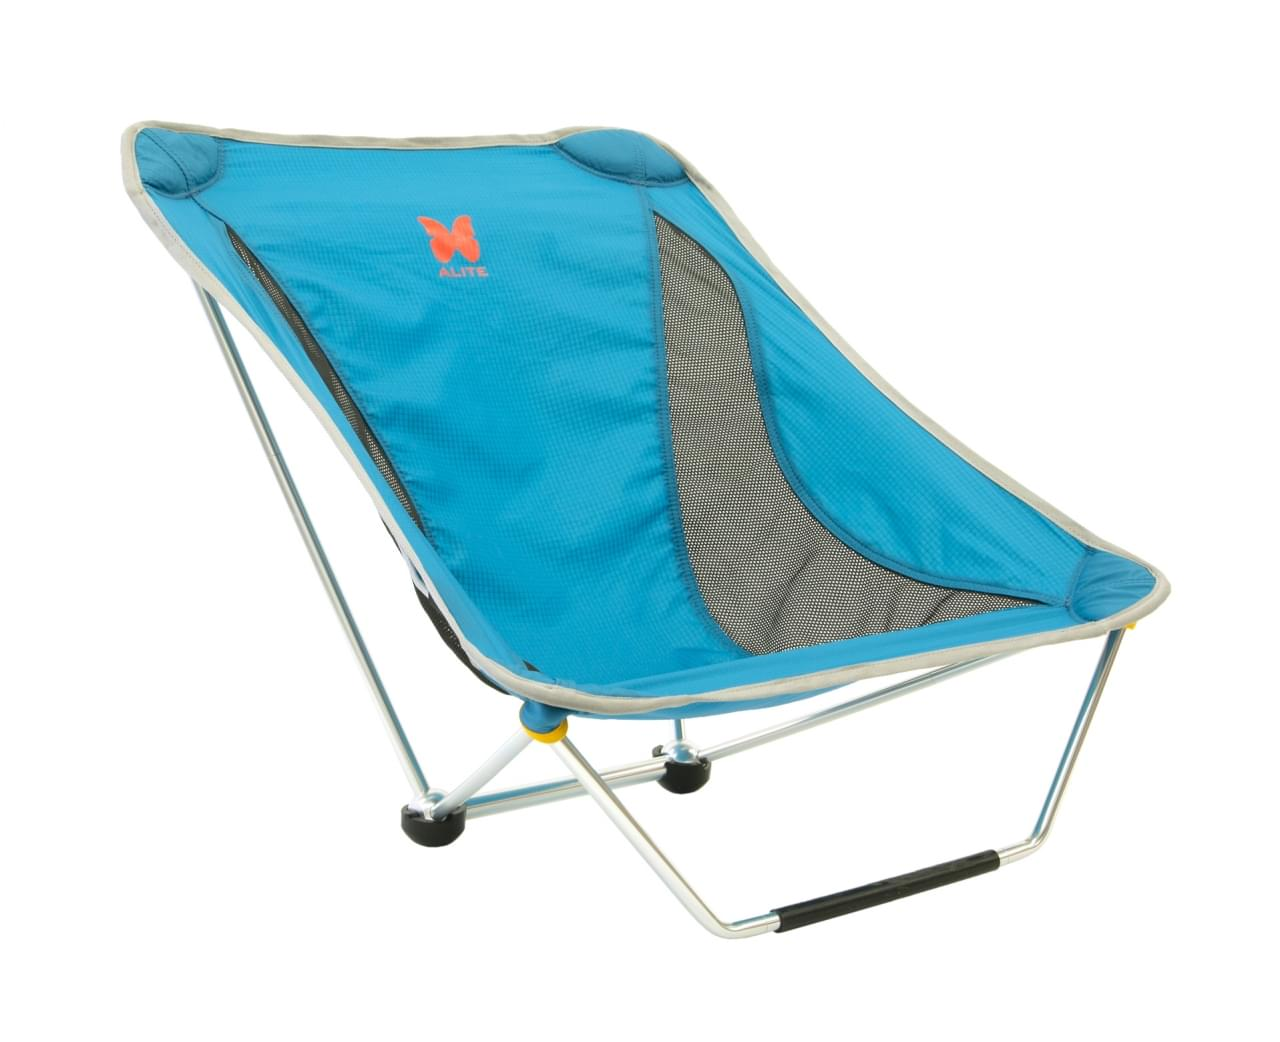 Alite Mayfly Chair 2.0